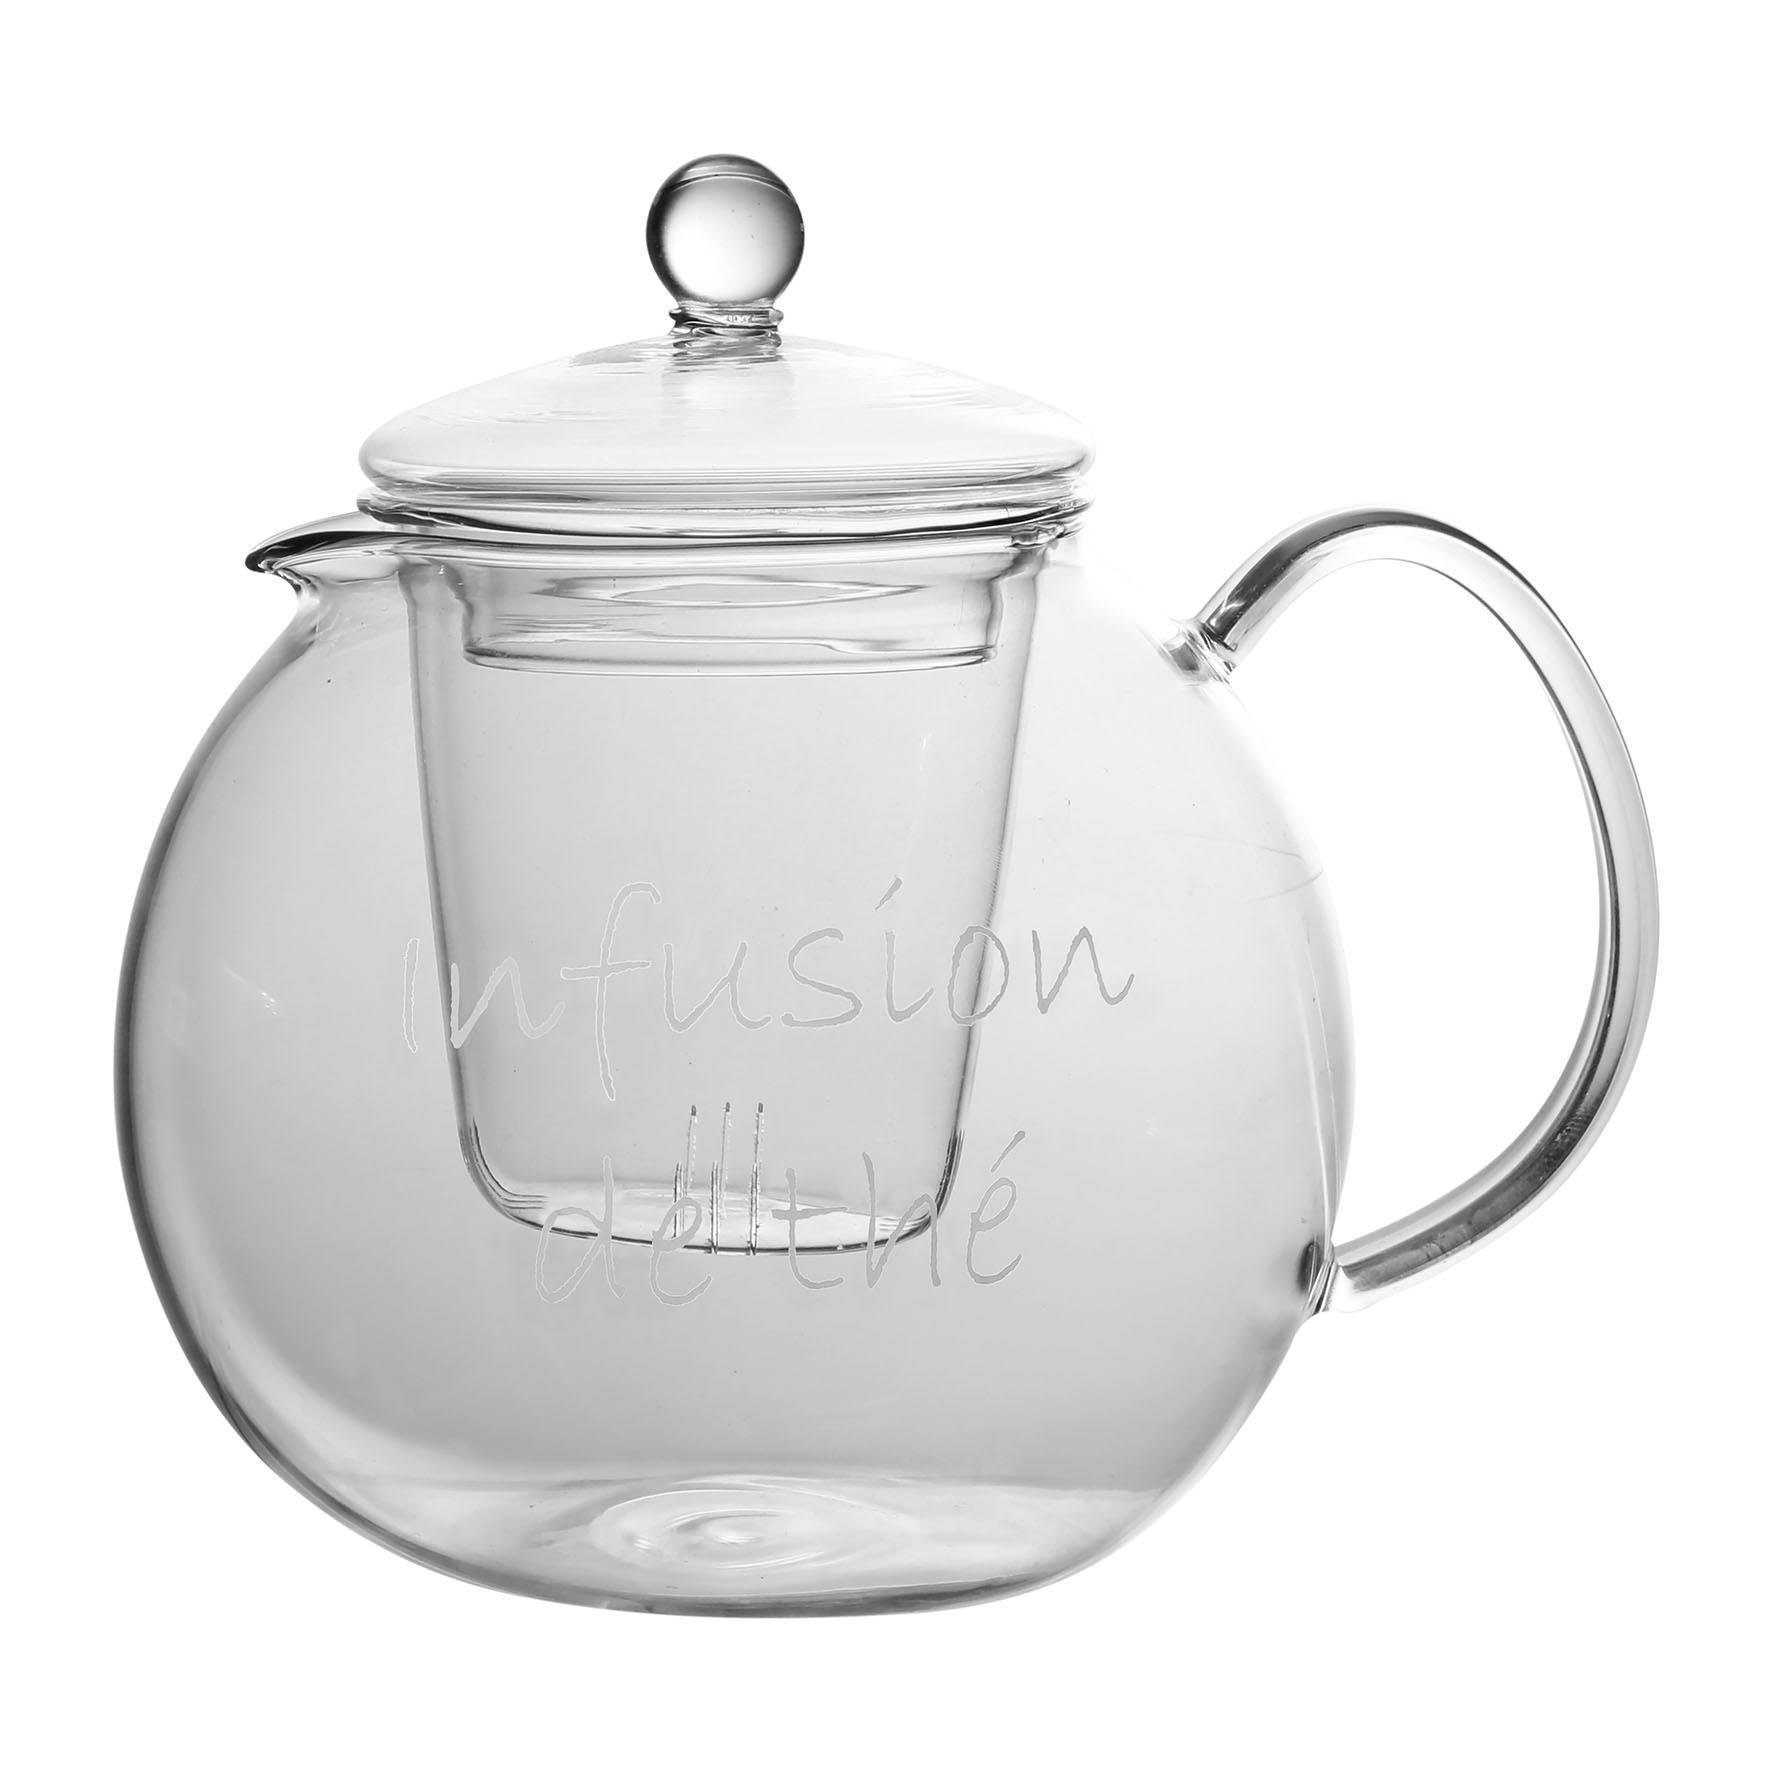 CÔTÉ TABLE Skleněná konvice na čaj Clear 1,5l, čirá barva, sklo